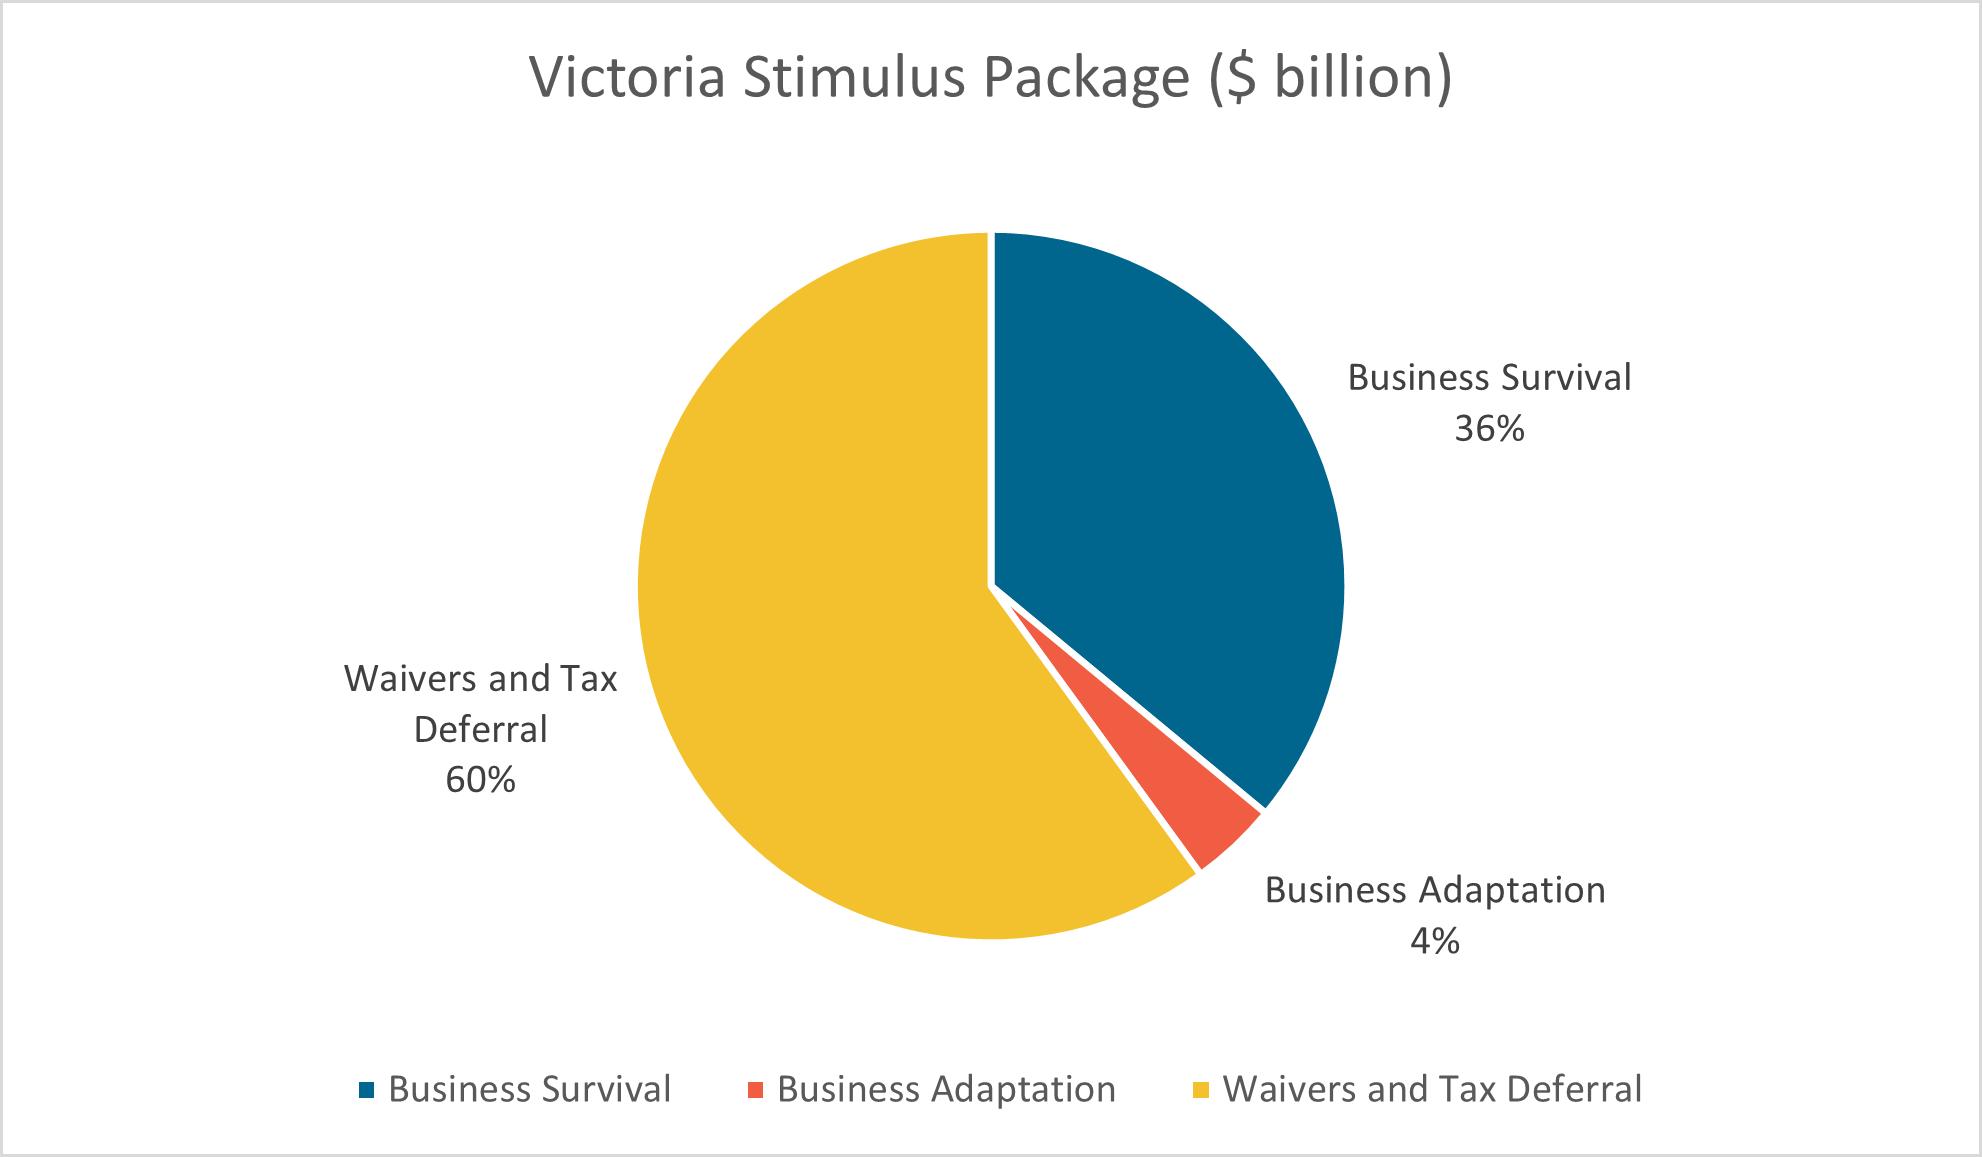 Victoria stimulus pie chart